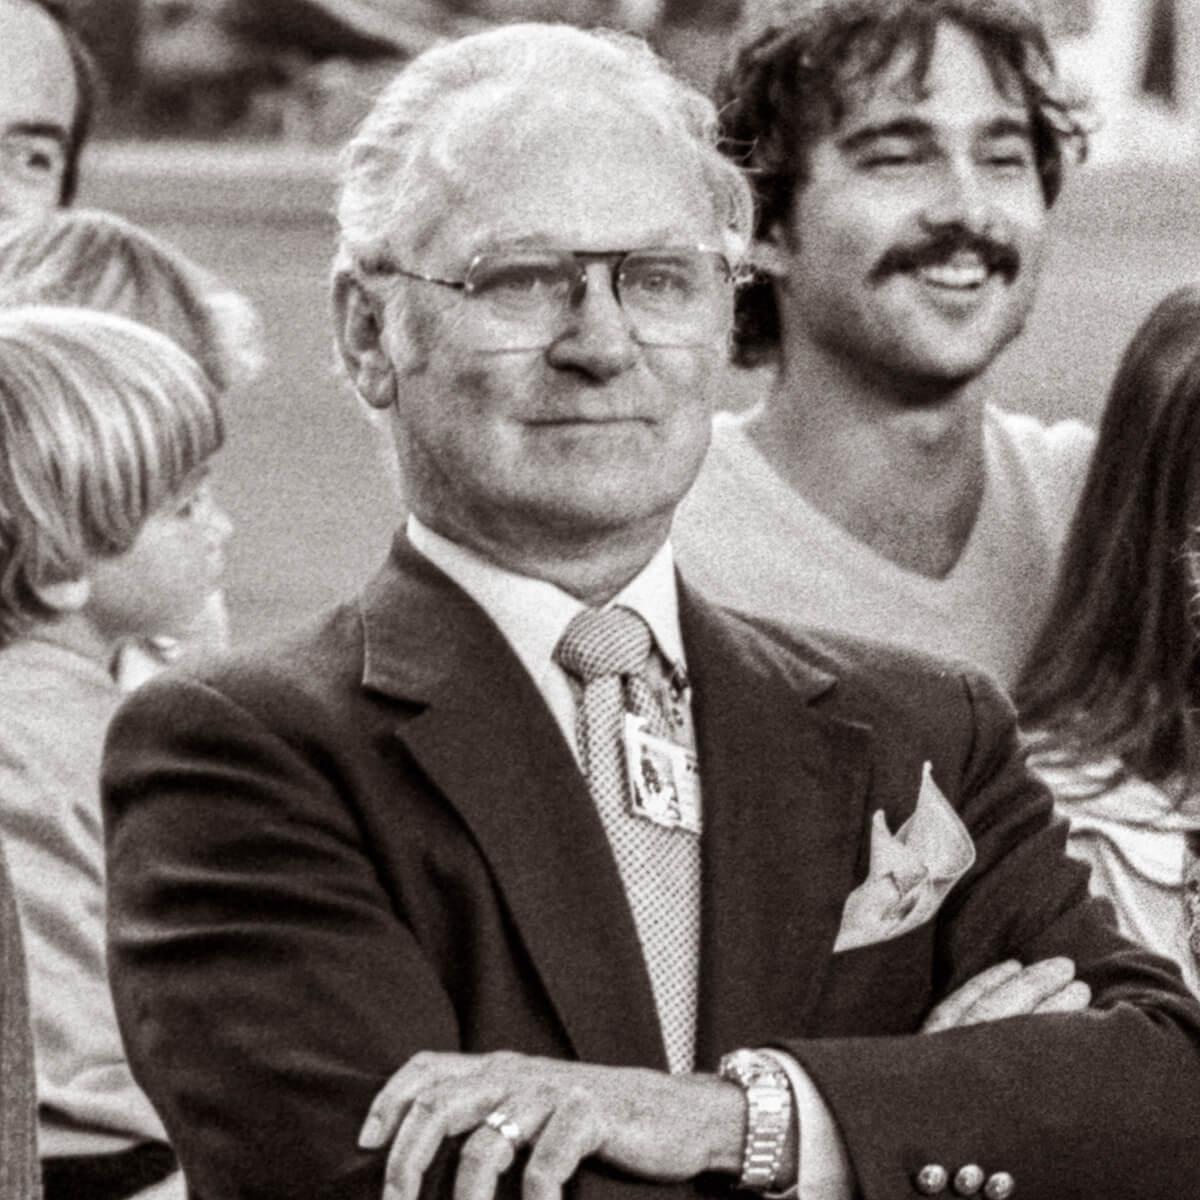 Jerry Seawright 1982